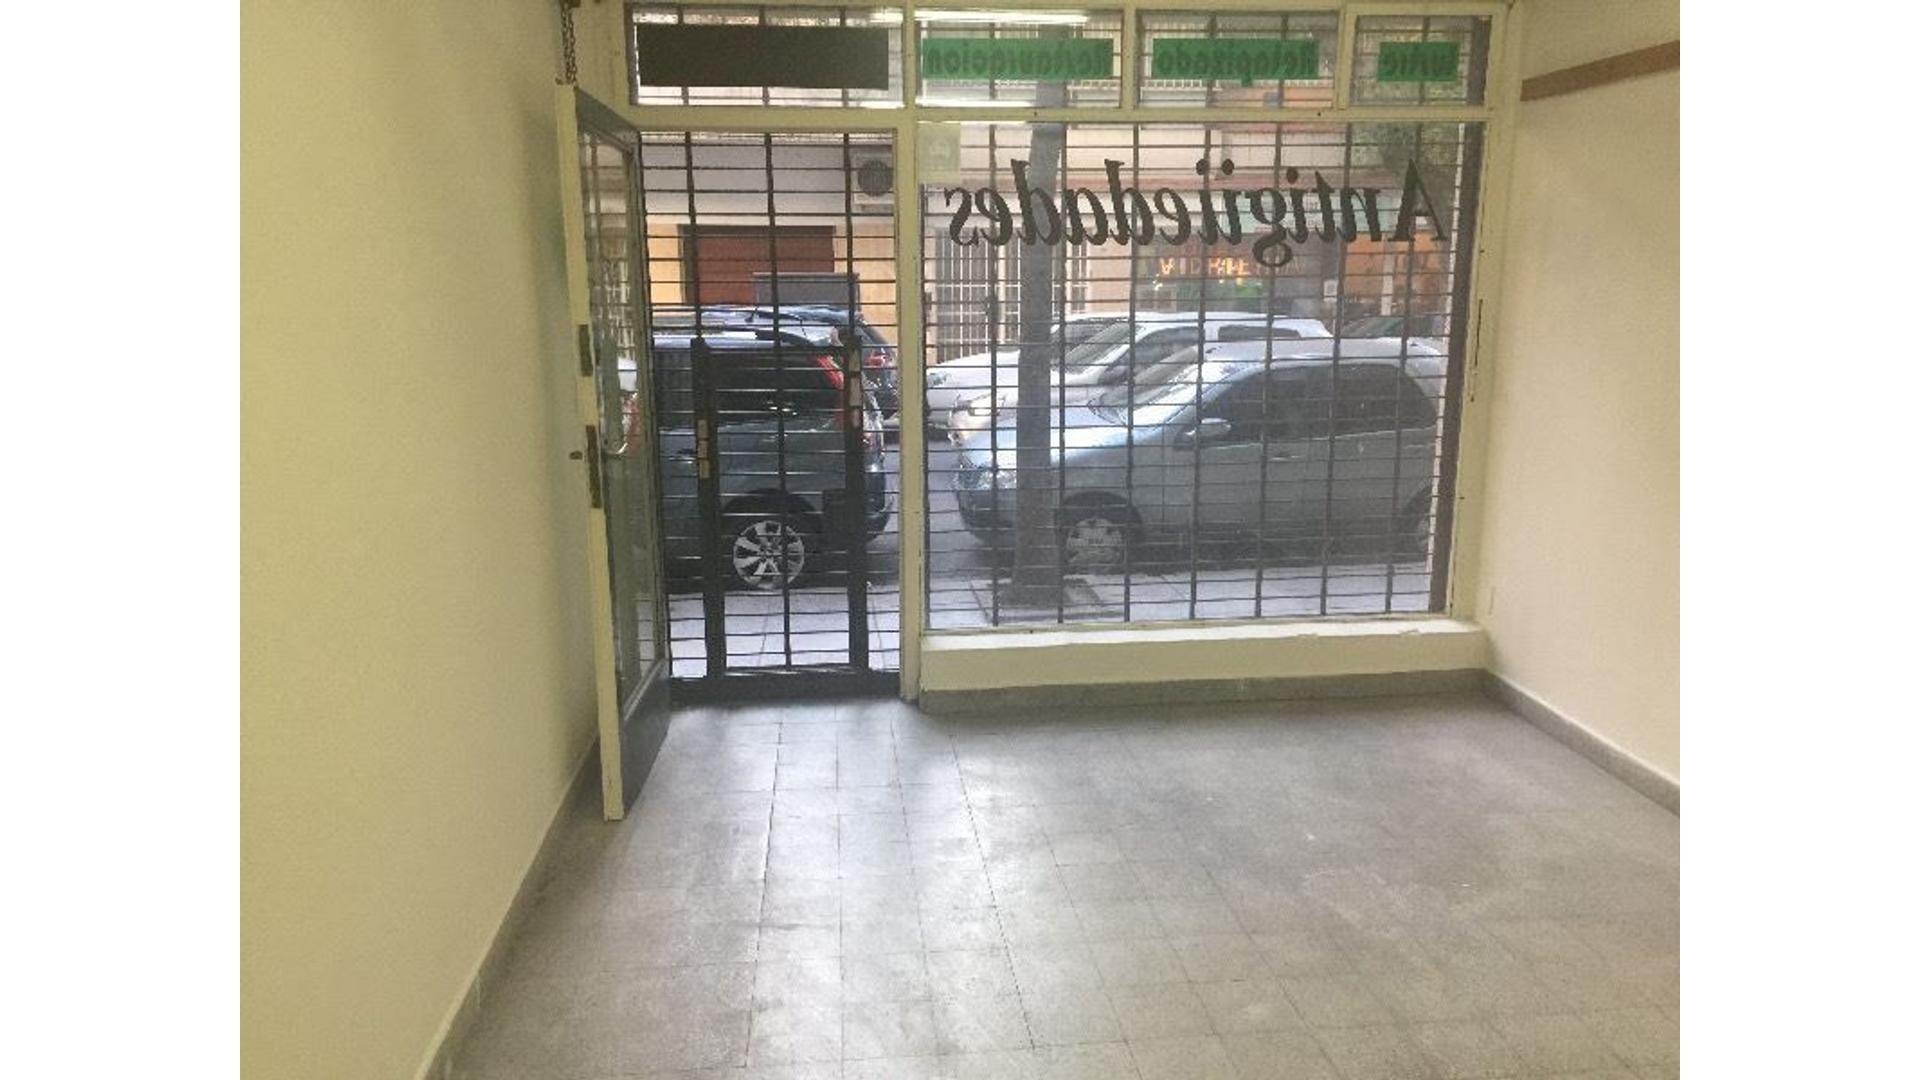 Dueño vende excelente local en Belgrano, Moldes y juramento. Apto mini- mercado